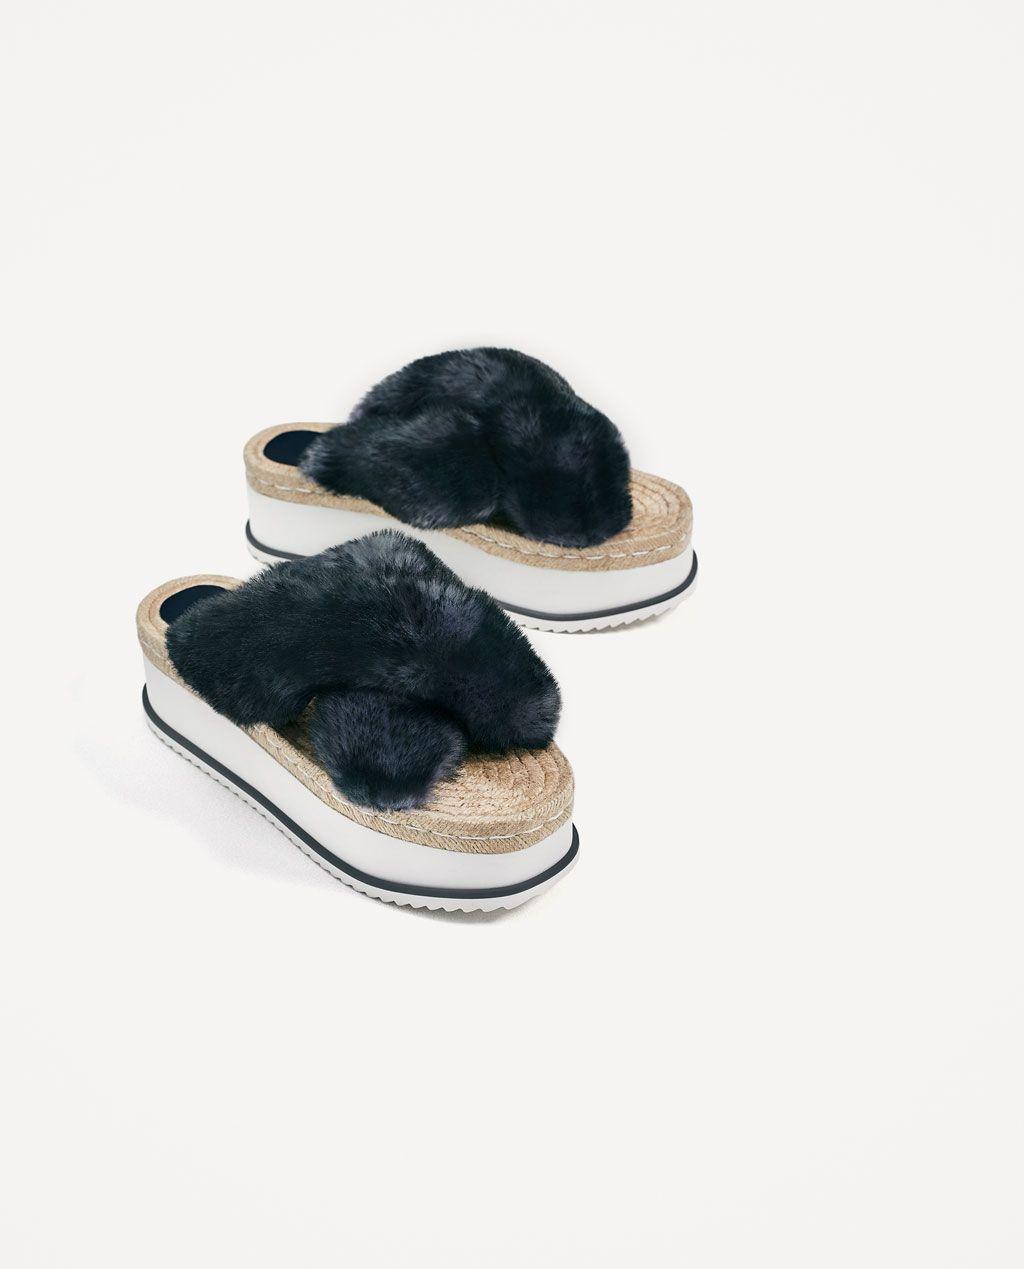 d57076f97c46 CUÑA PLATAFORMA PELO | Shoes and Bootish | Shoes, Zara fashion, Fashion